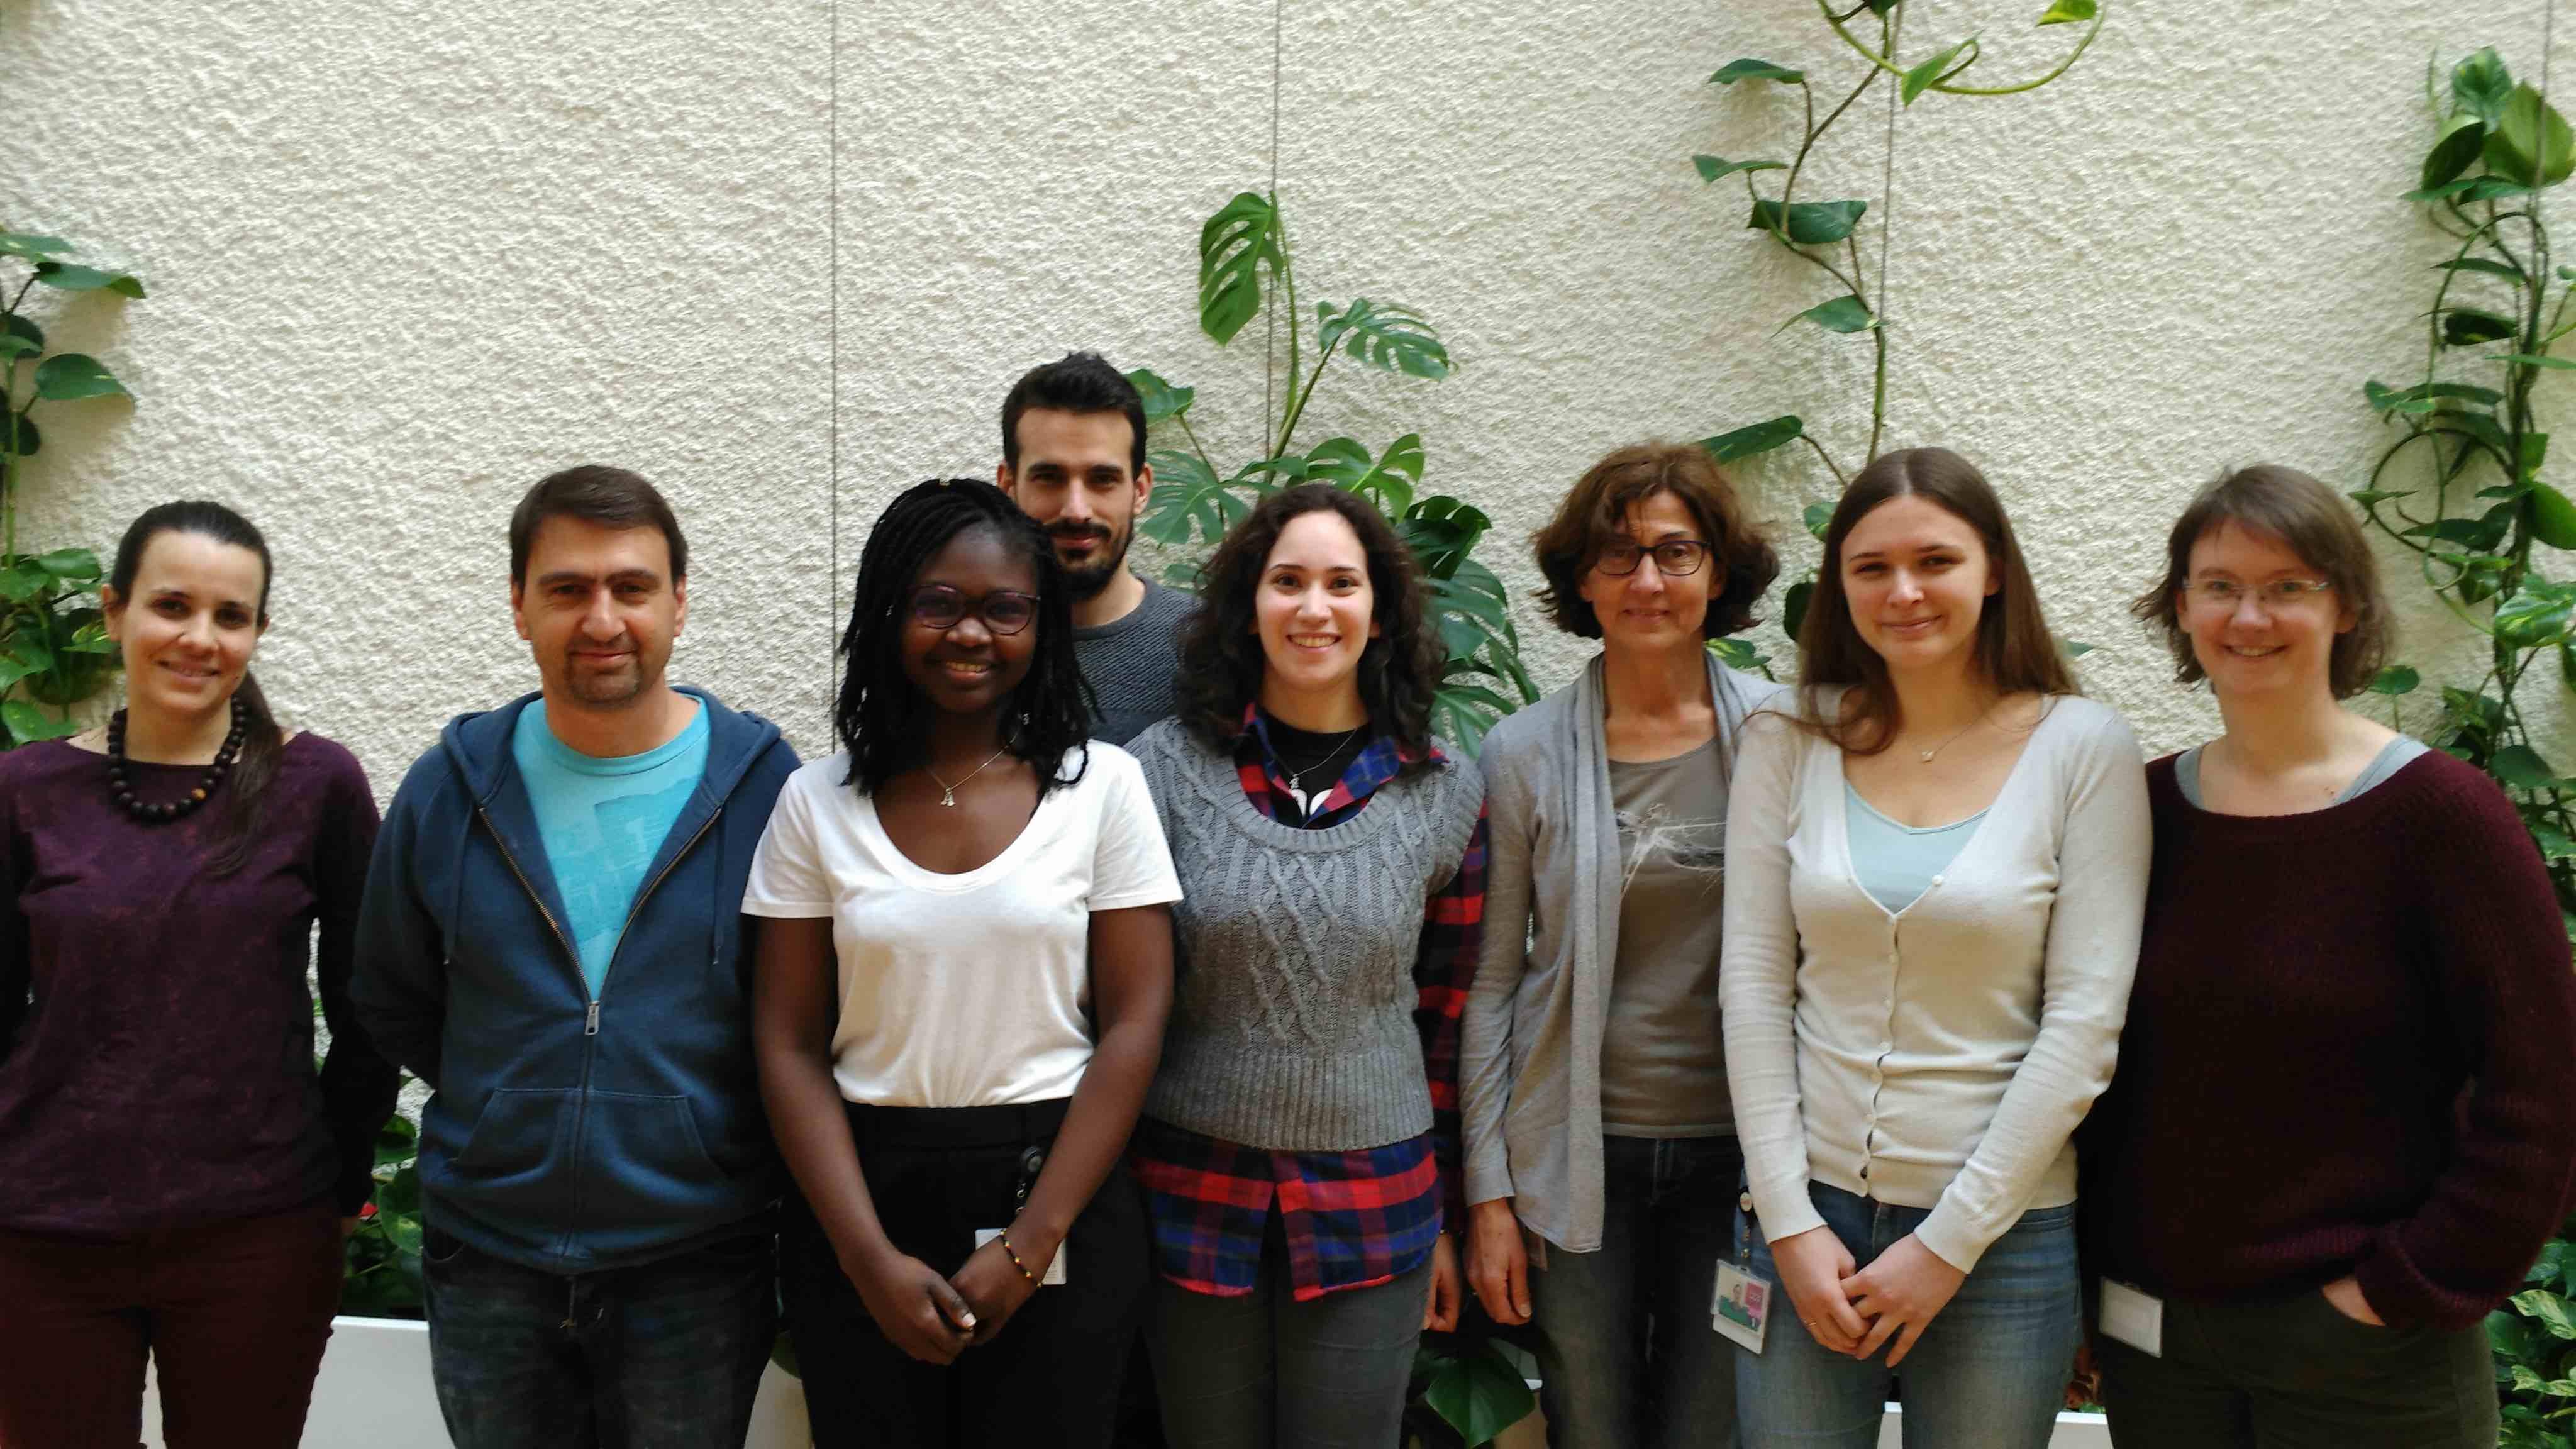 equipe timmins - ibs - institut de biologie structurale   france